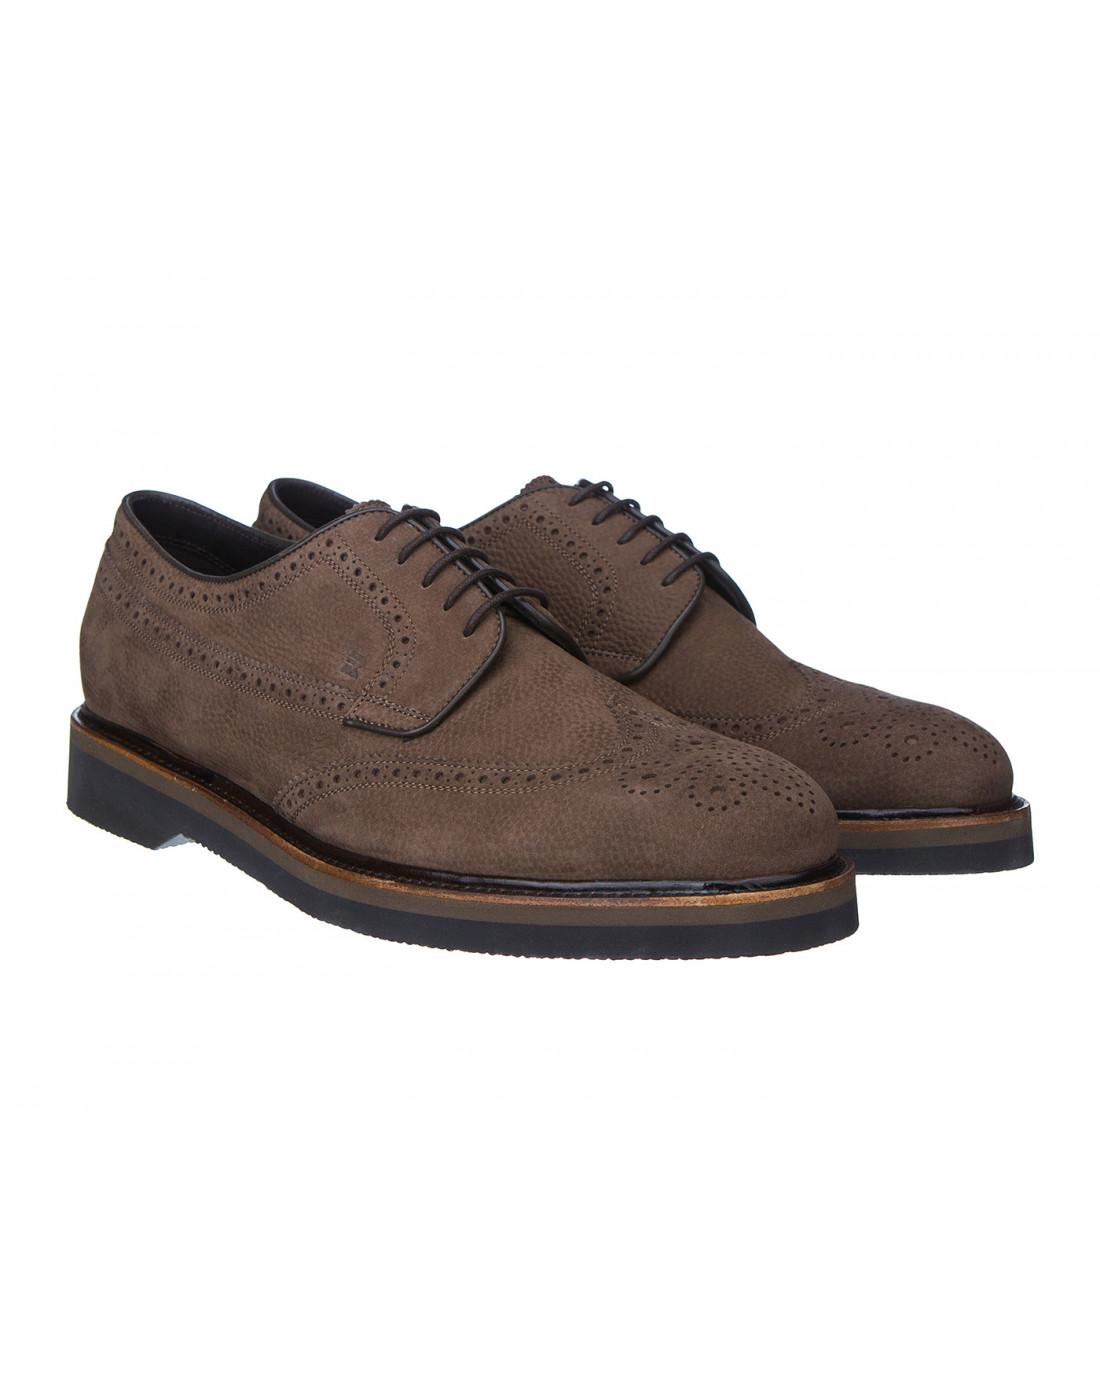 Туфли бежевые мужские Fratelli Rossetti S45900-2